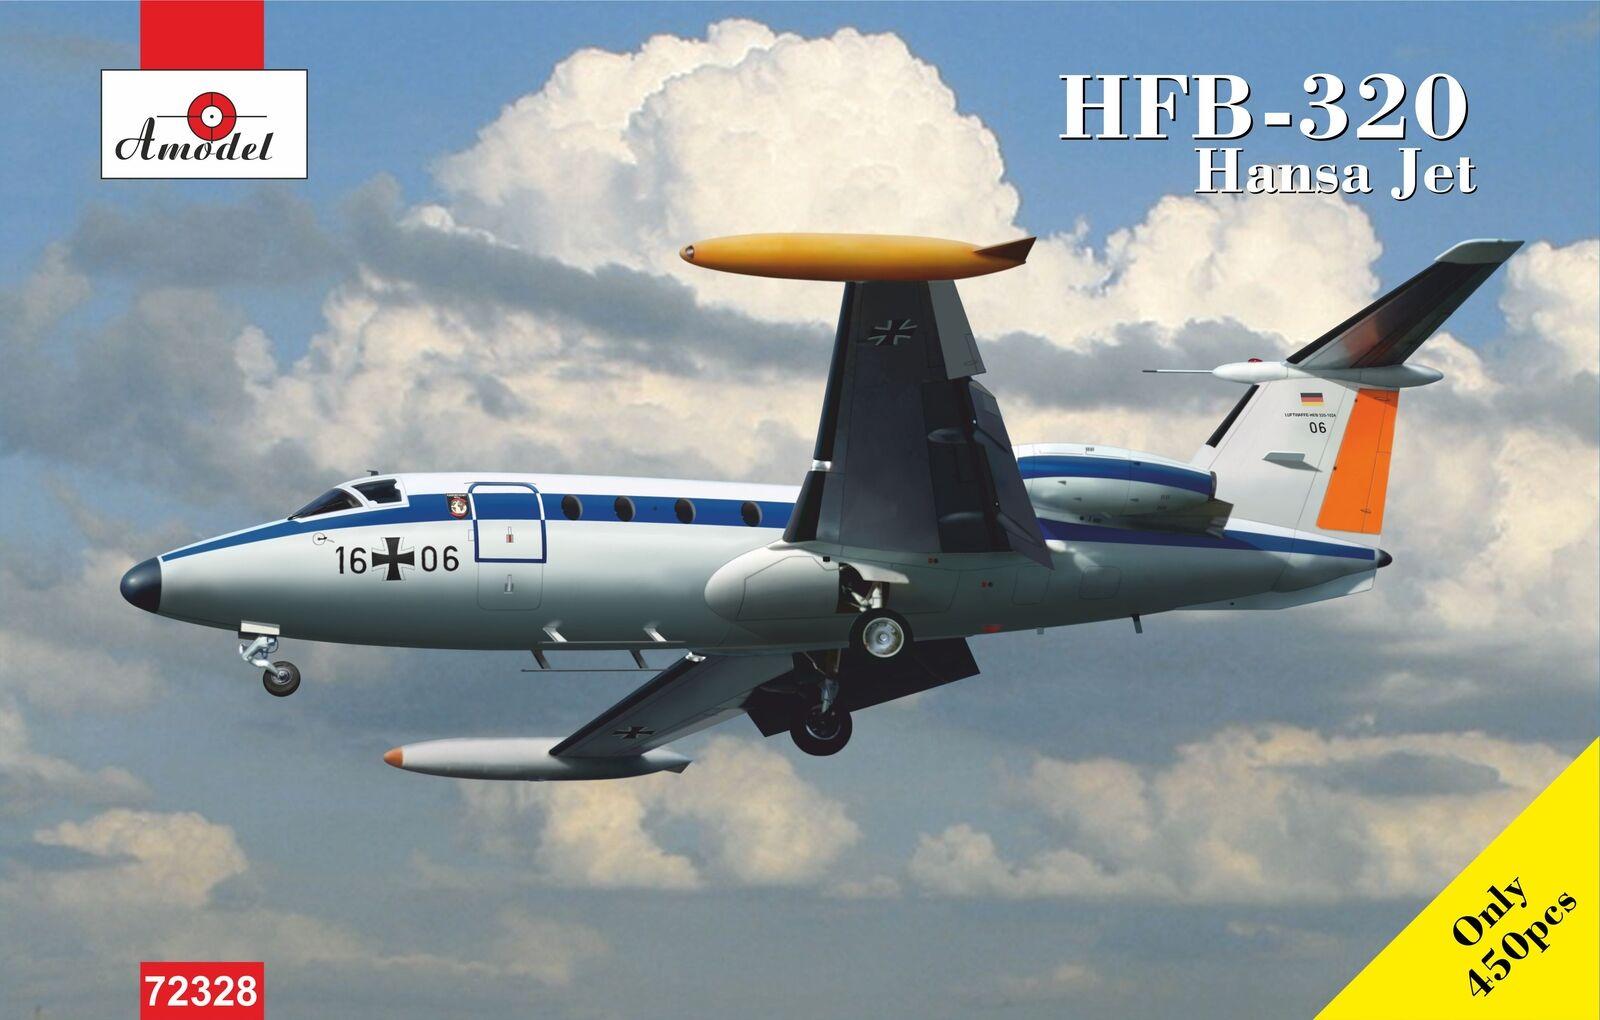 i nuovi stili più caldi Amodellolo 1 72 Hfb-320 Hansa Jet 'Lufthansa' 'Lufthansa' 'Lufthansa'  72328  autorizzazione ufficiale